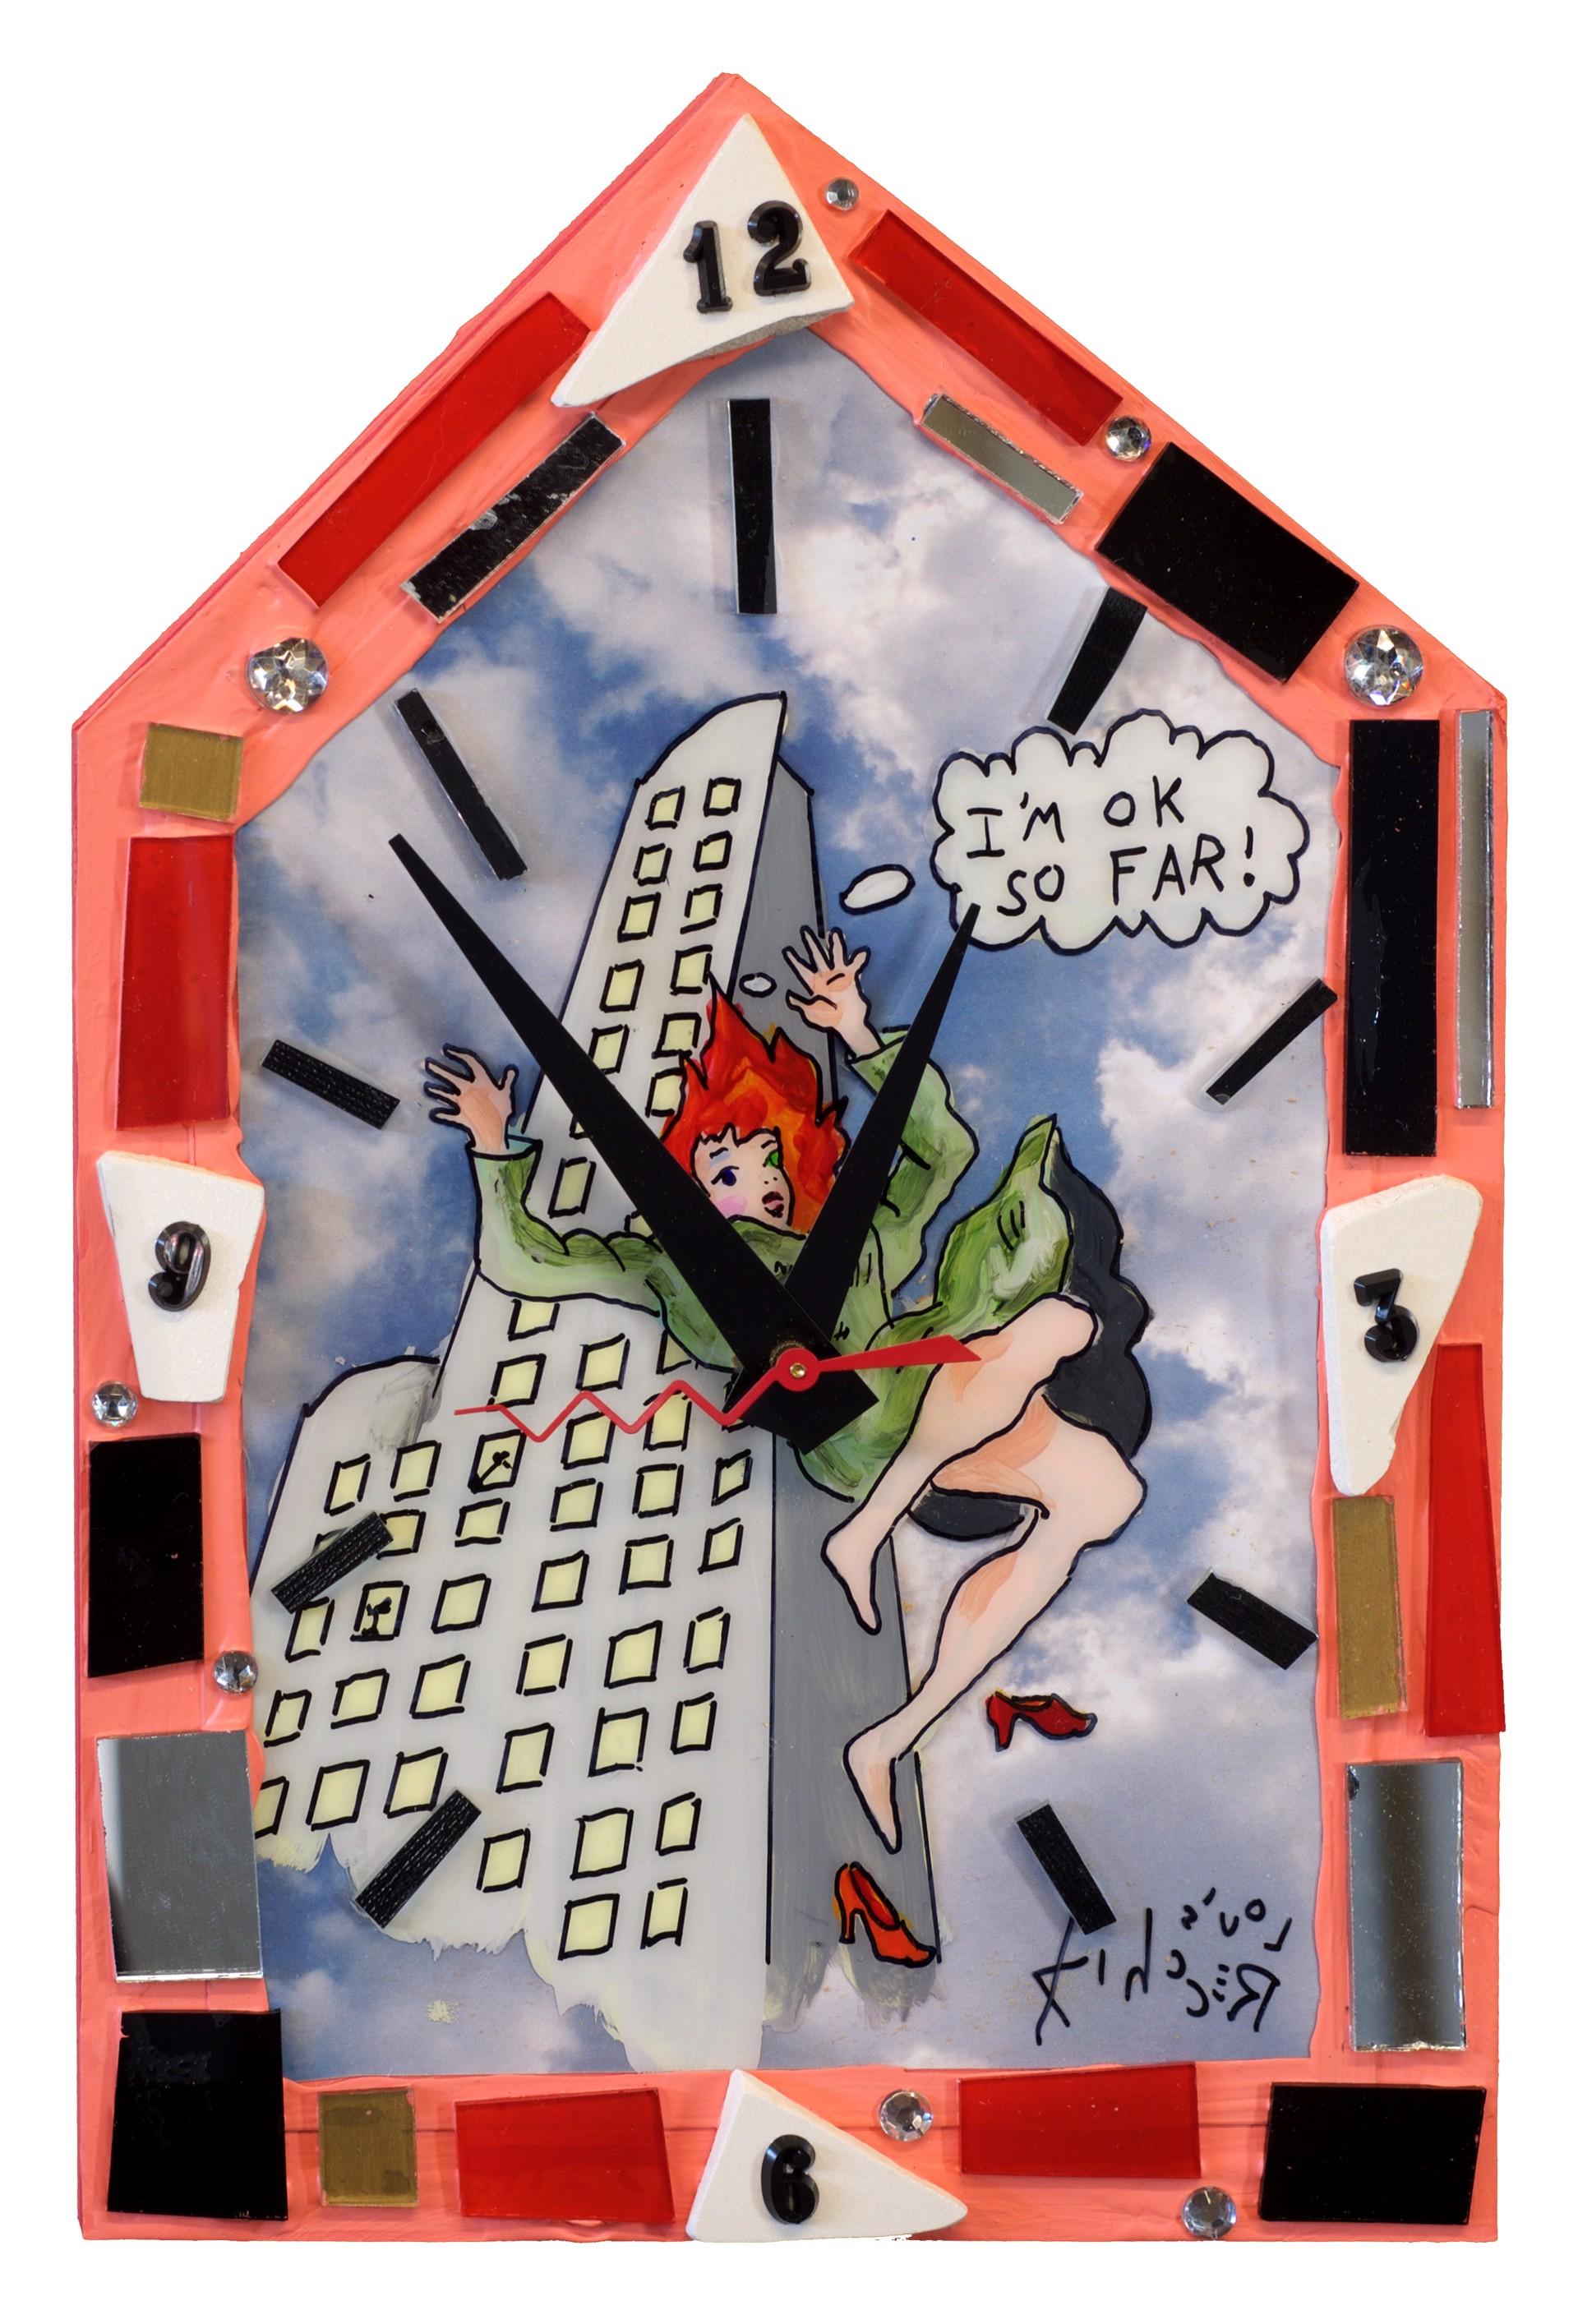 I'm OK So Far Clock by Louis Recchia